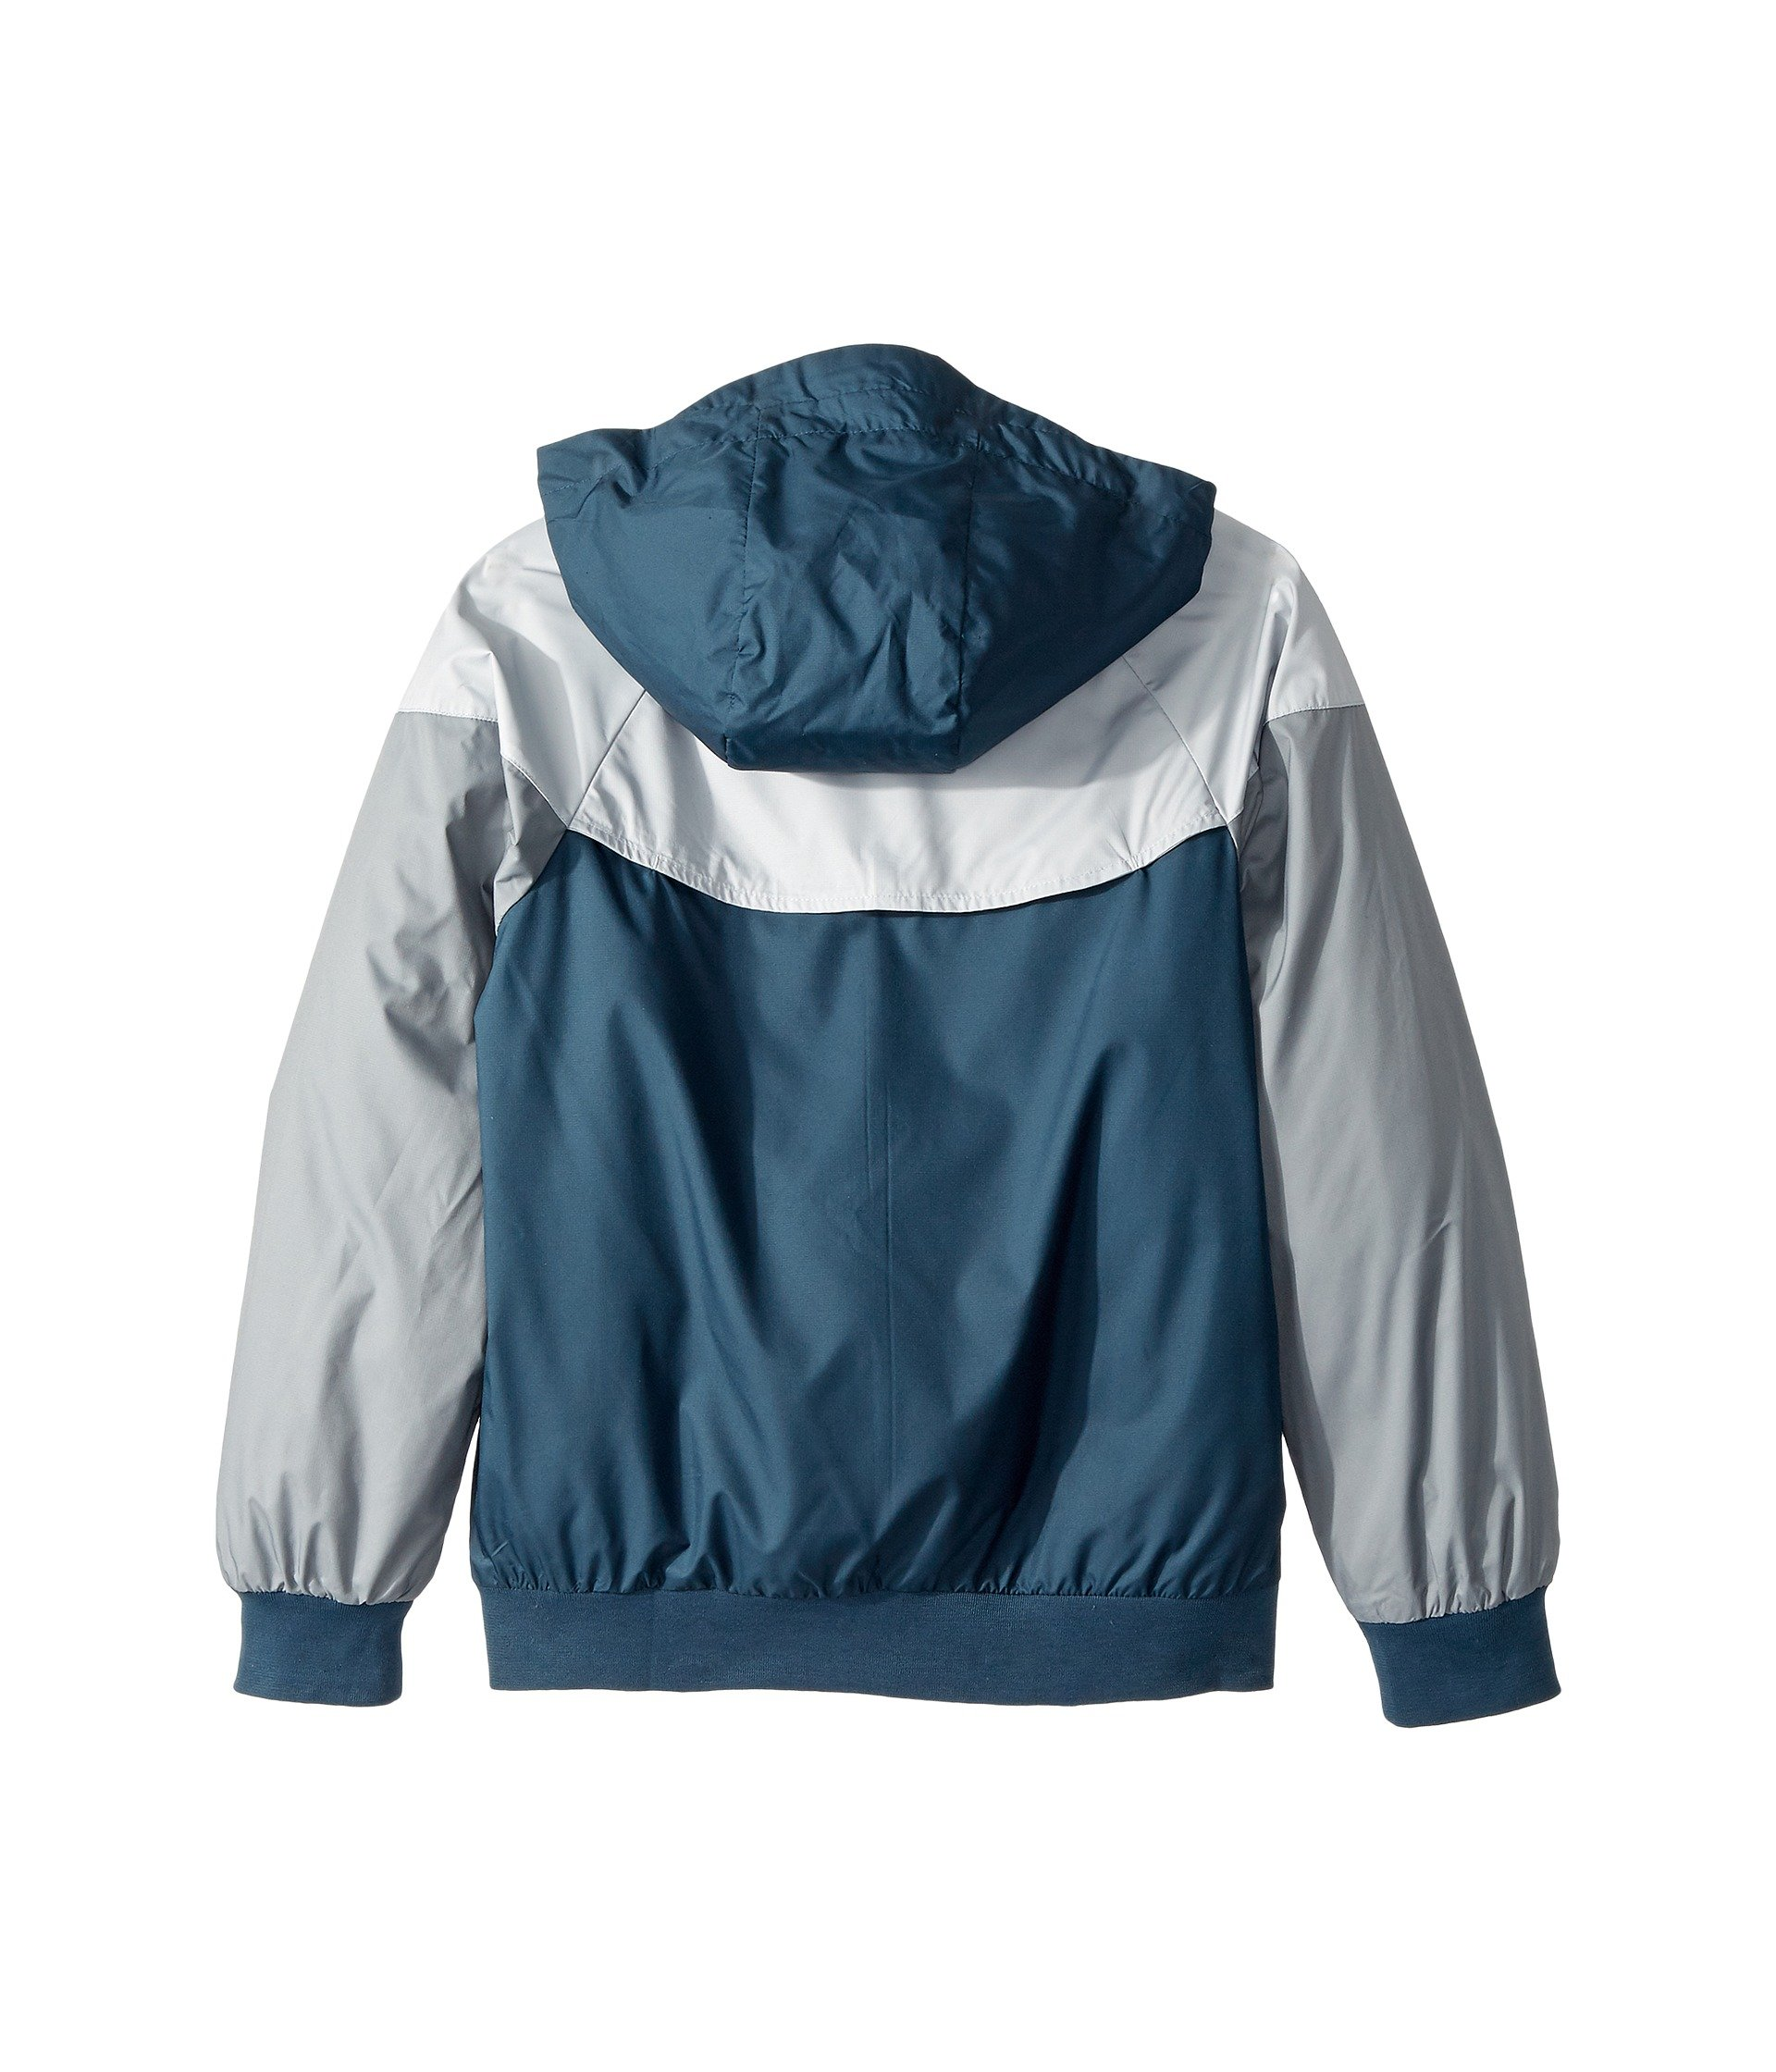 Nike windrunner jacket zappos